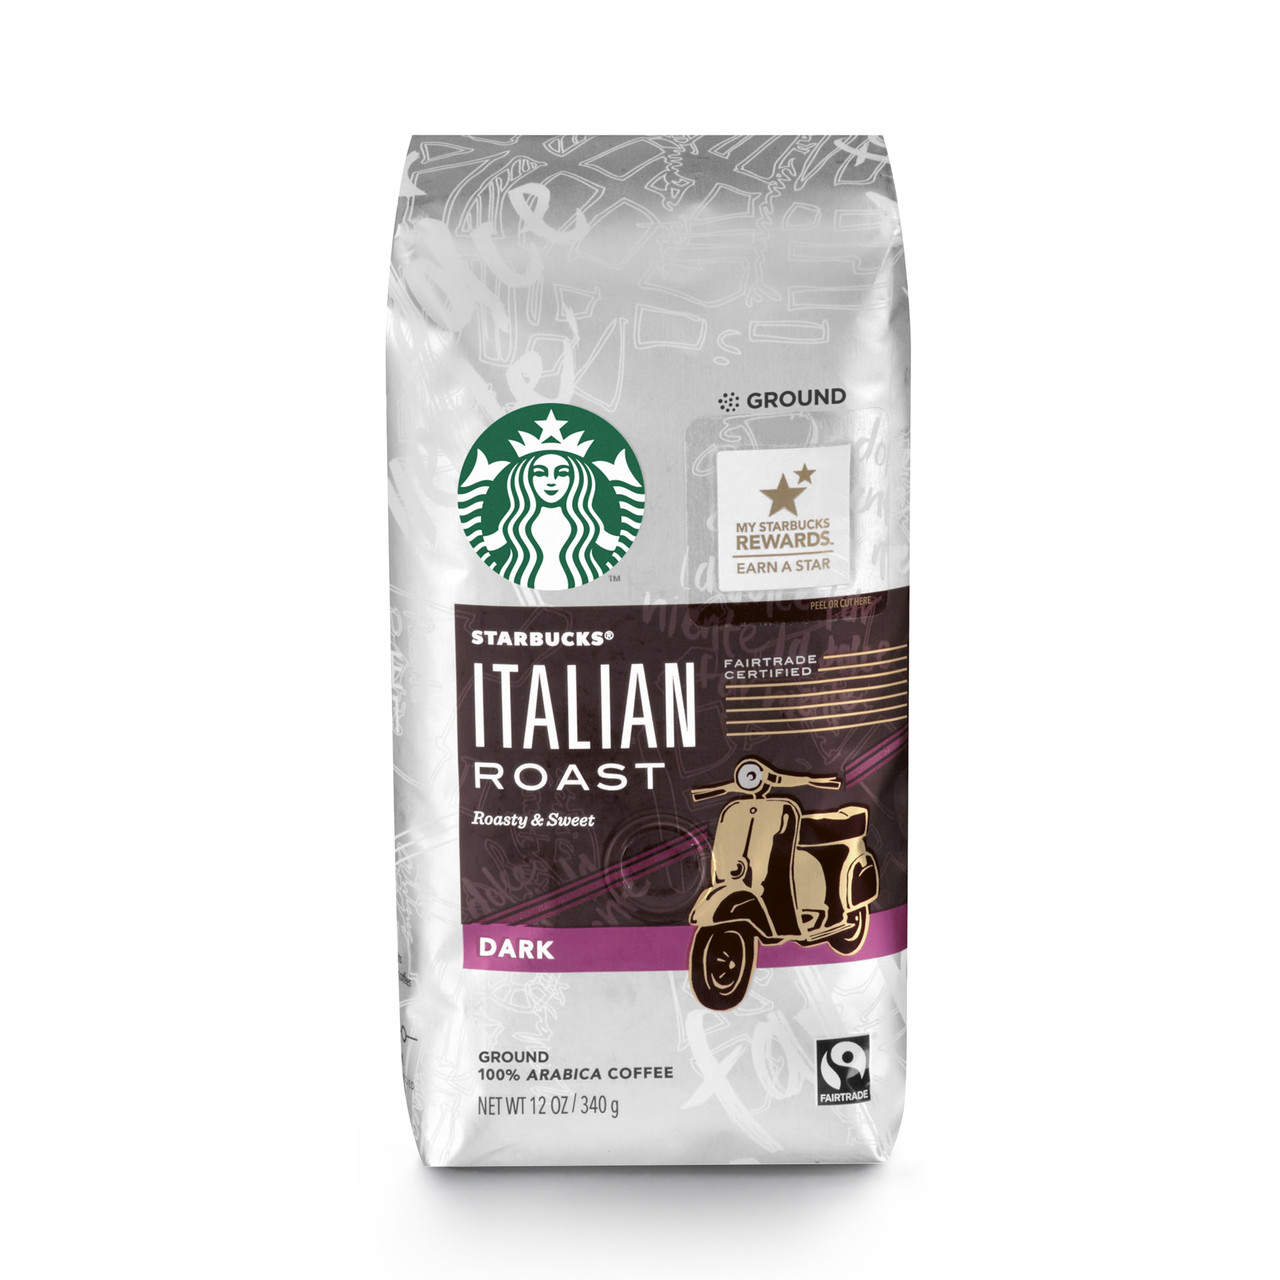 Кофе в зернах Starbucks Italian Roast 340 гр., США